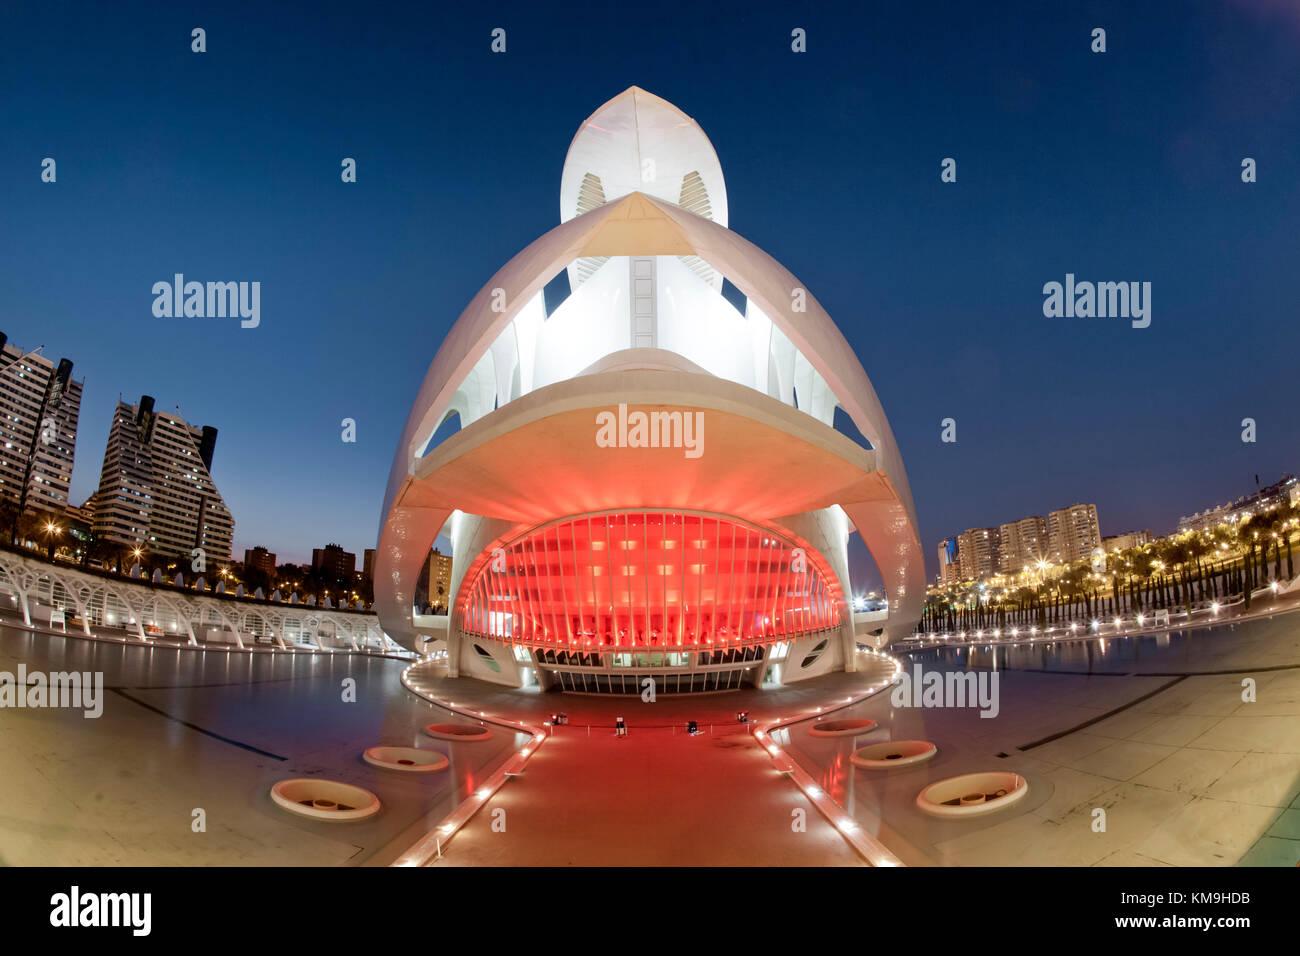 The Palau de les Arts Reina Sofia by Calatrava, , Valencia, Spain - Stock Image